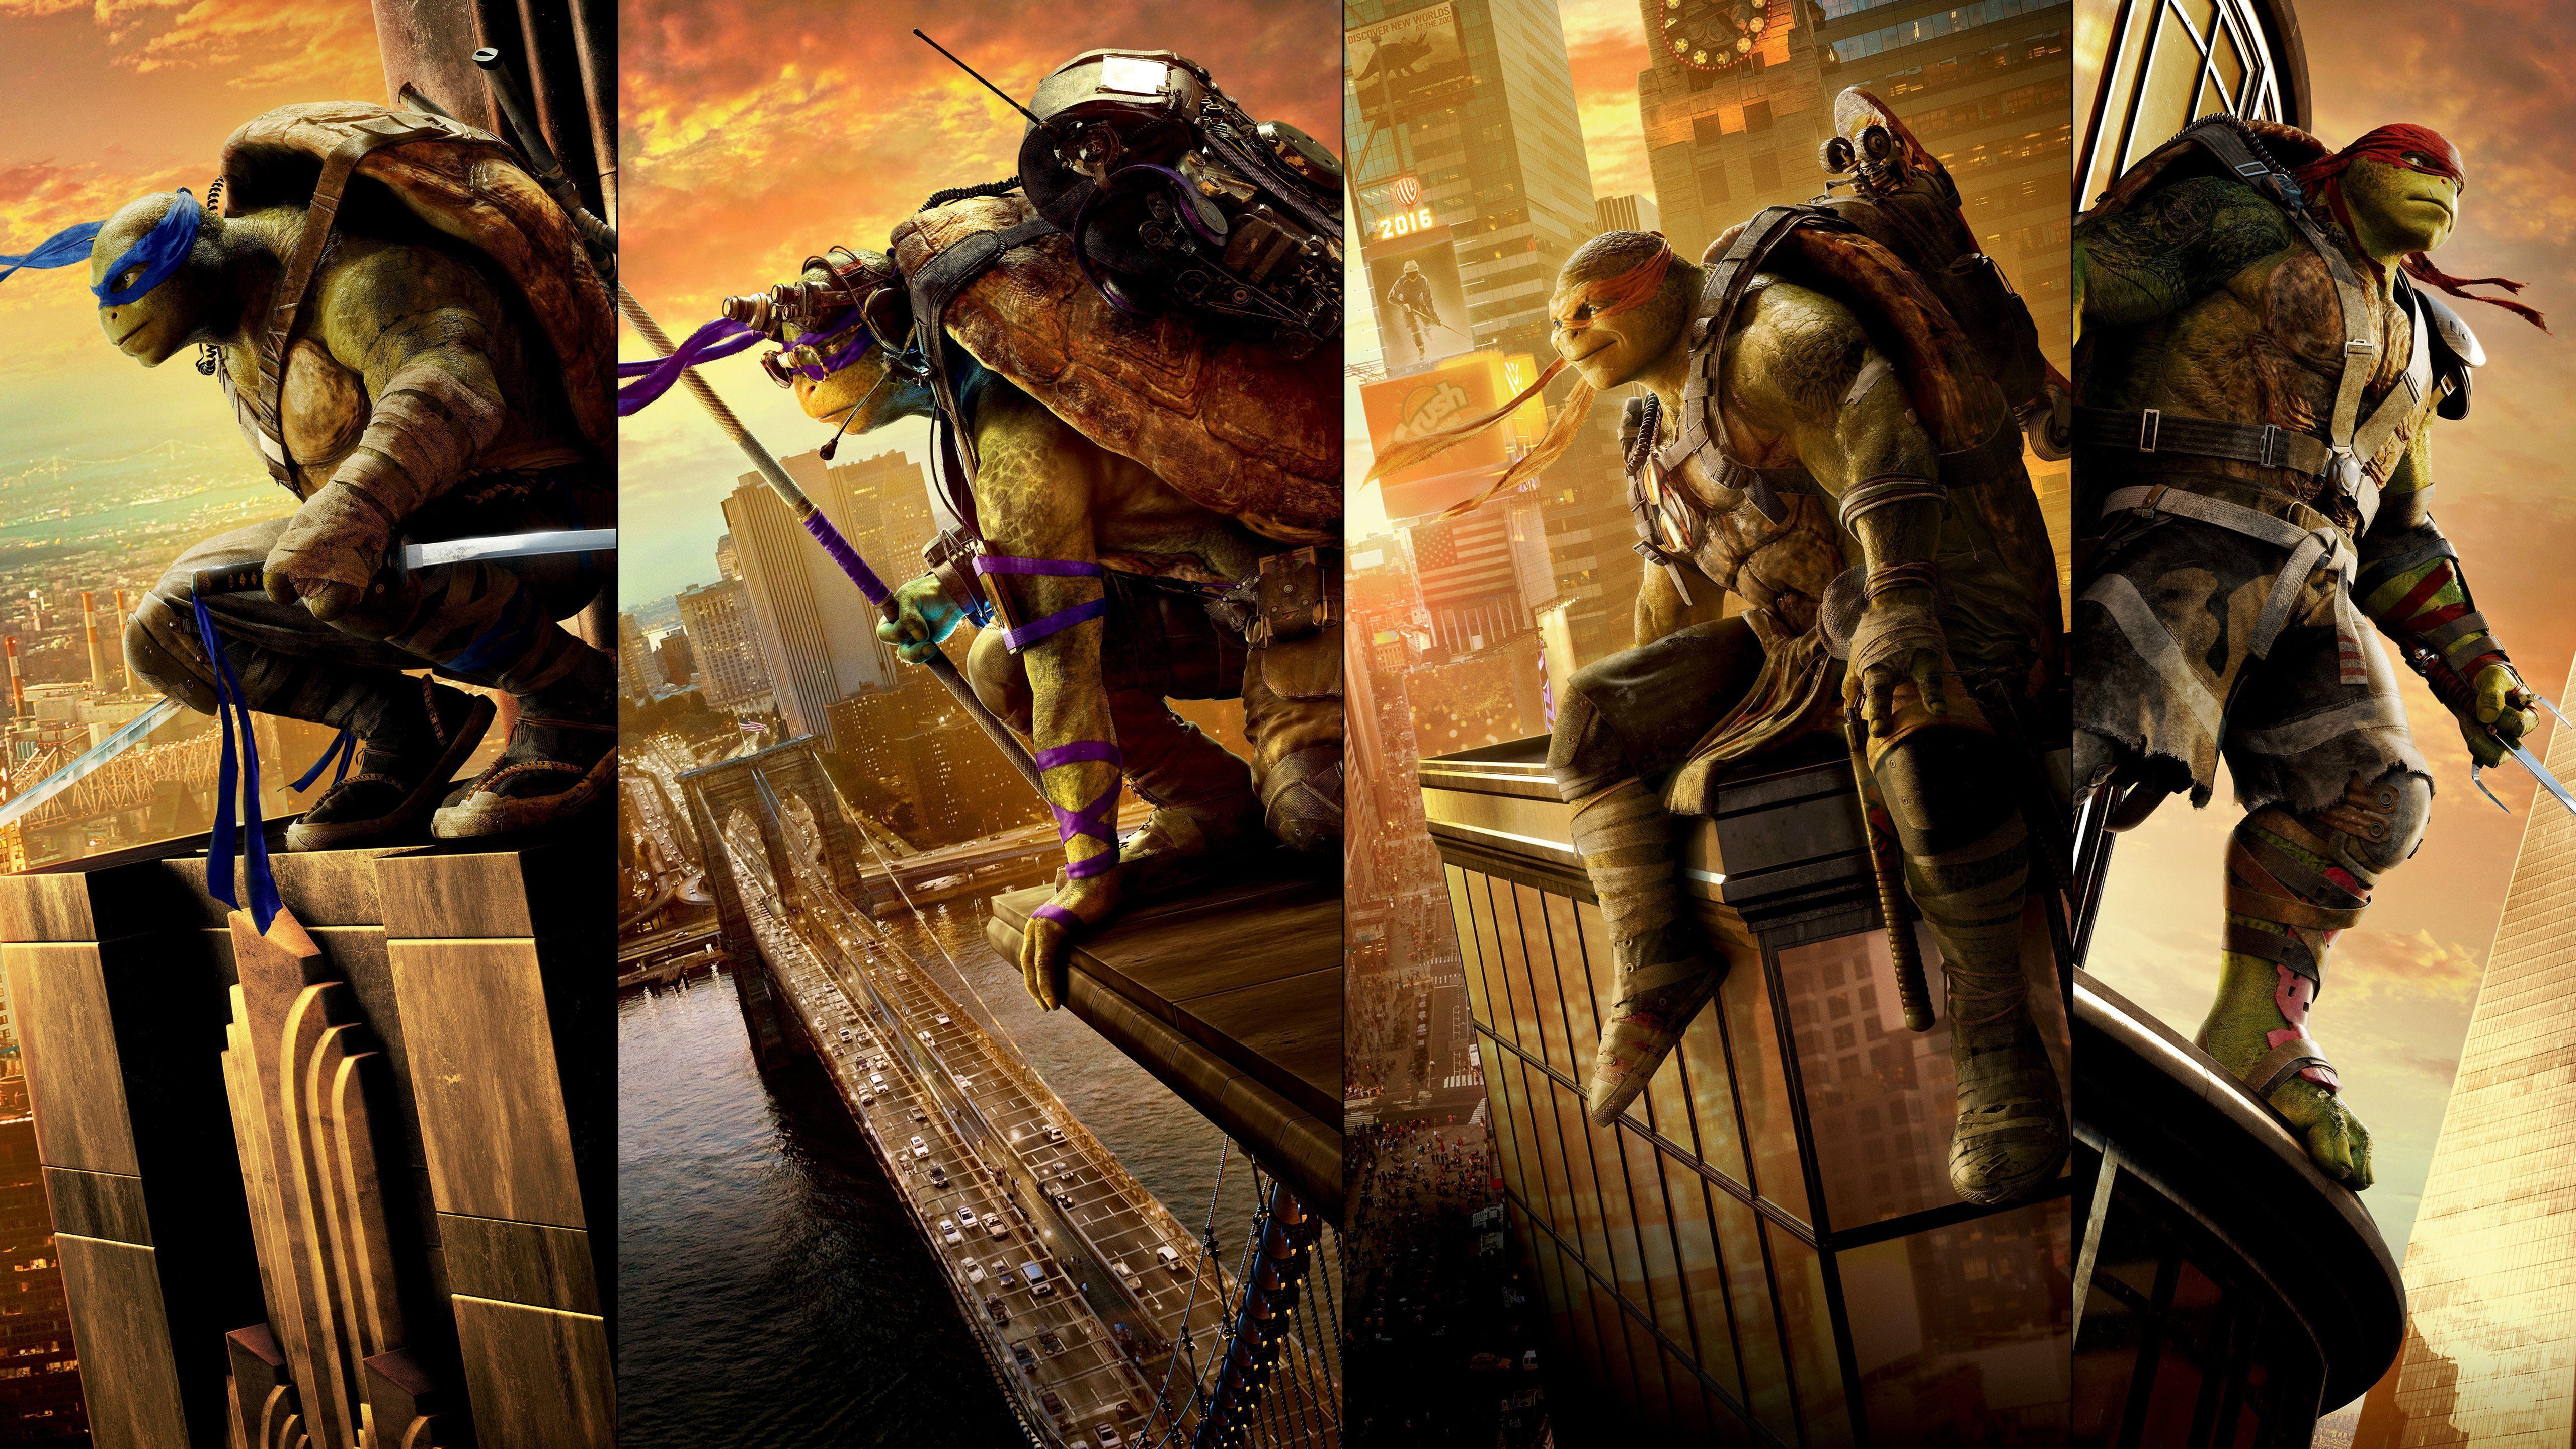 Teenage Mutant Ninja Turtles 2017 Wallpapers Wallpaper Cave